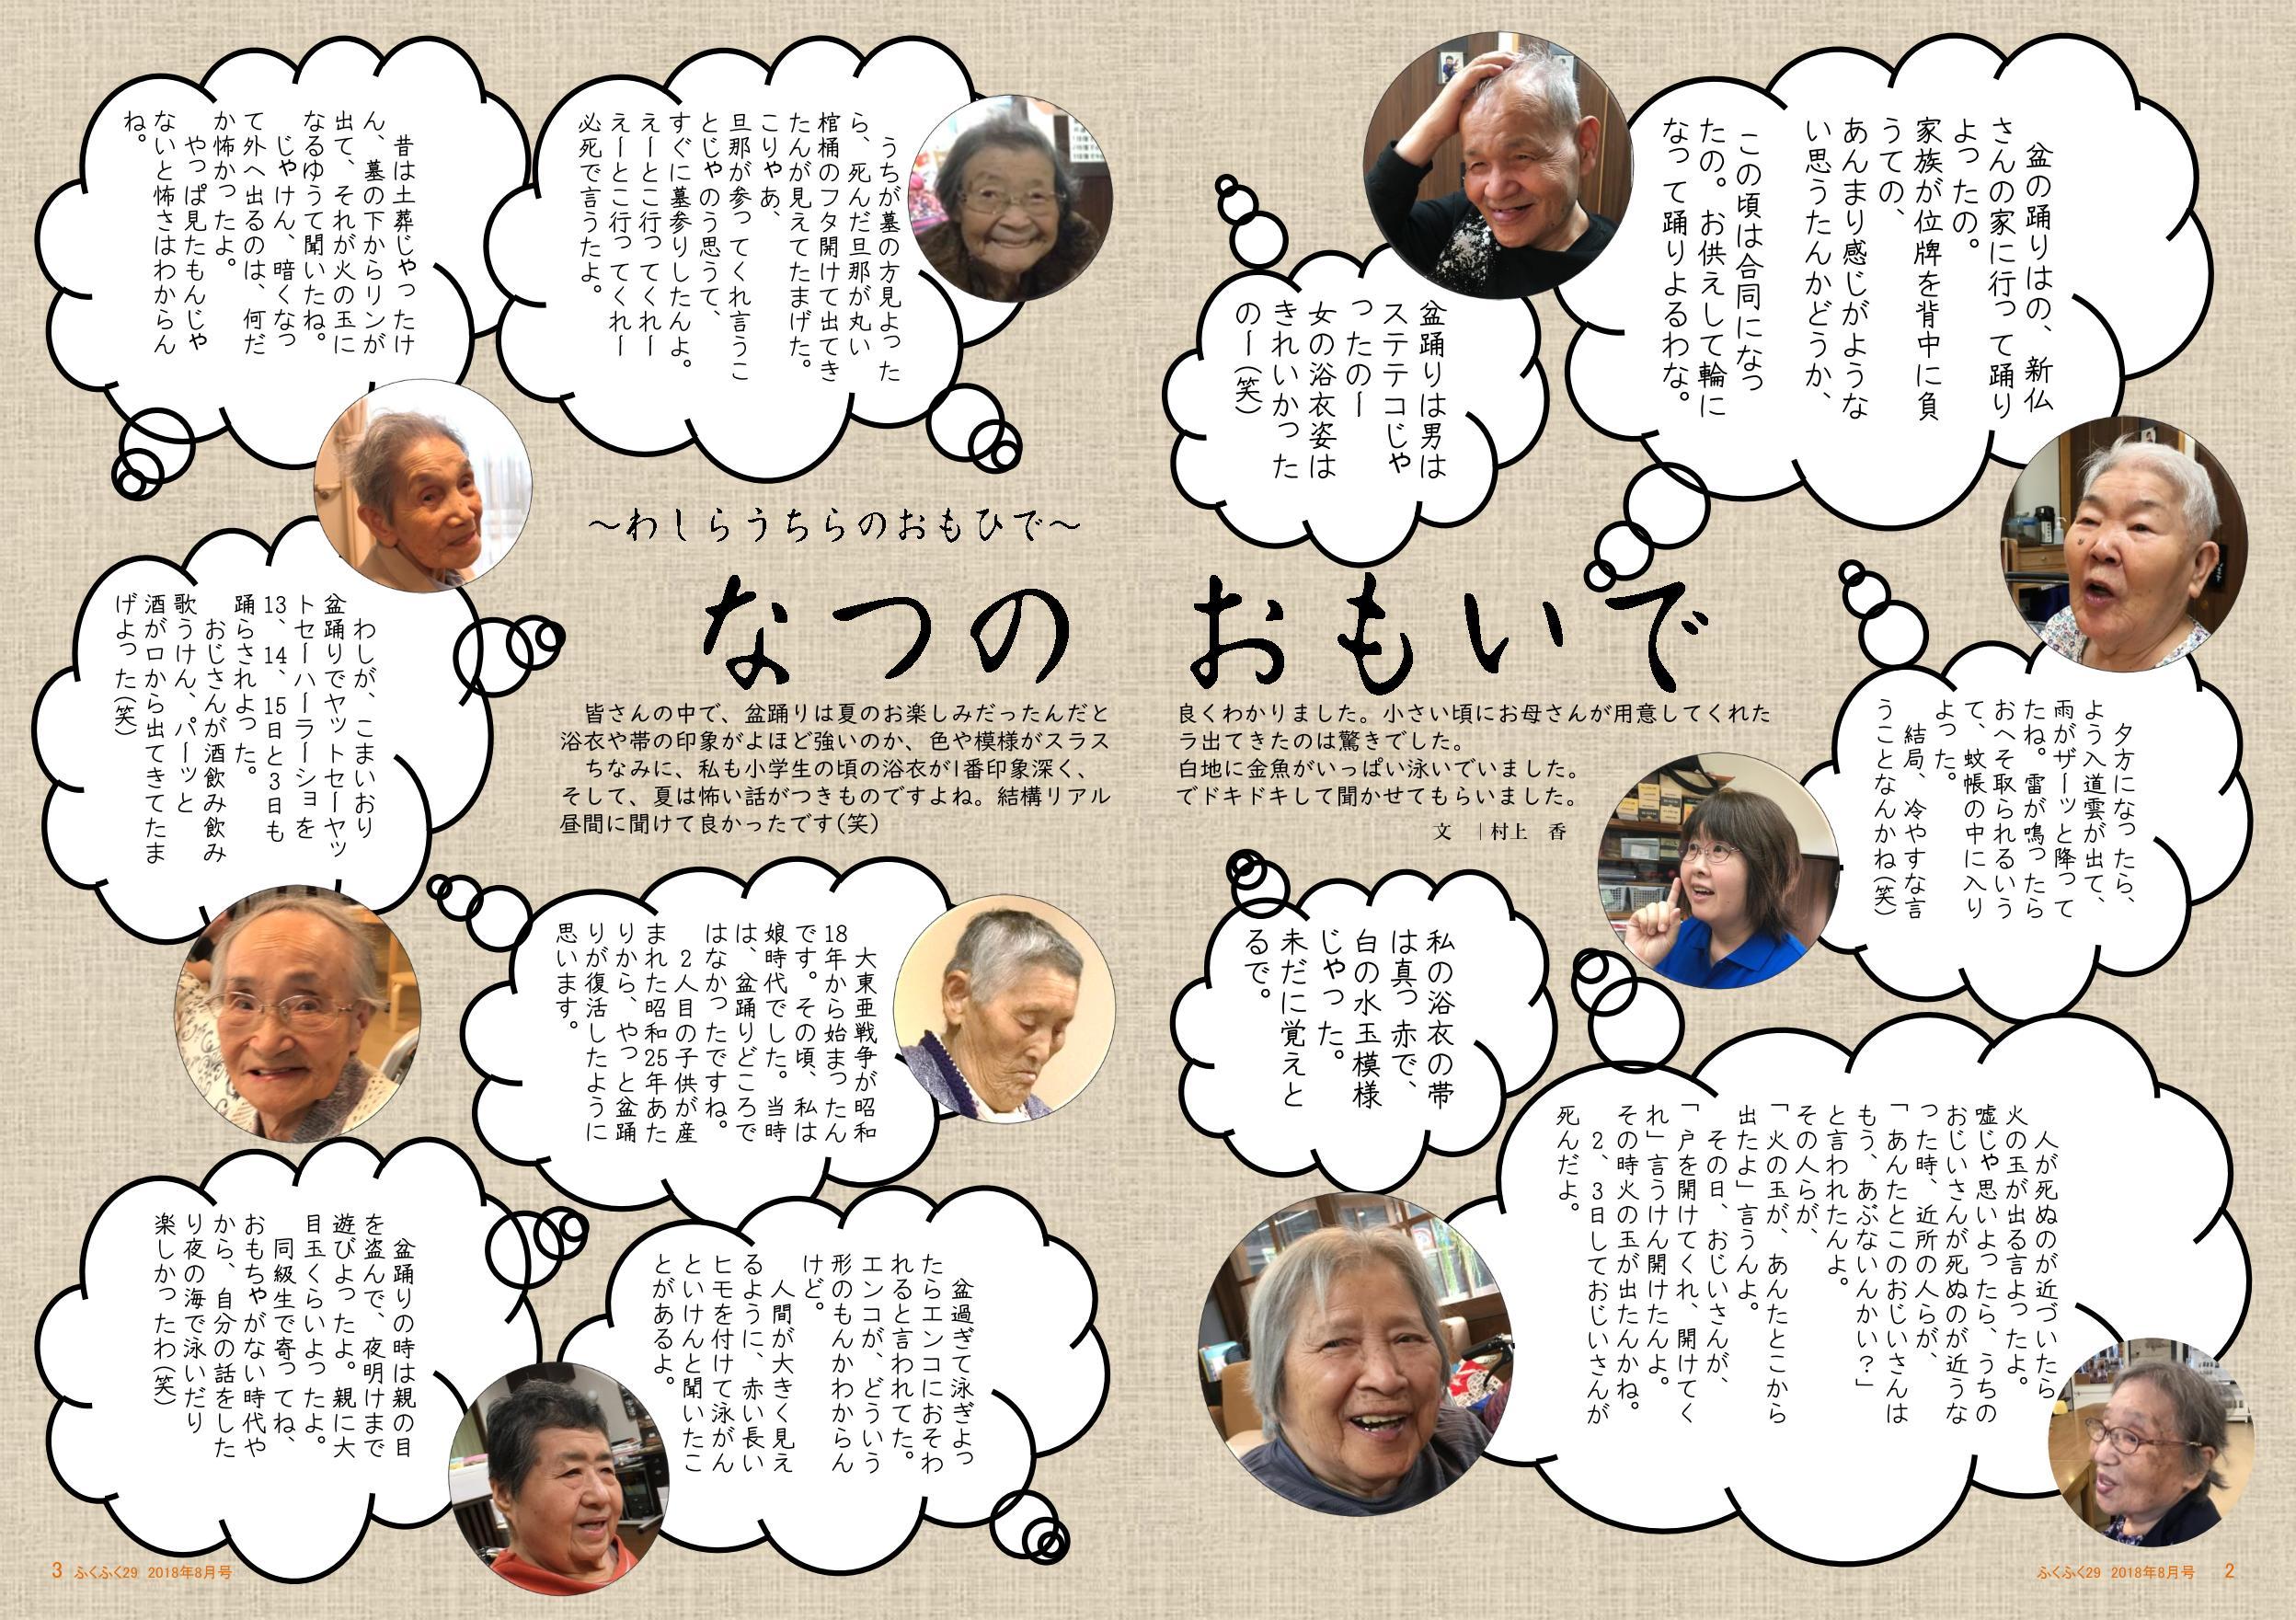 http://fukufukunokai.com/newsletter/images/8%E6%9C%88%E5%8F%B7%E5%85%A5%E7%A8%BF_cropped_2.jpeg